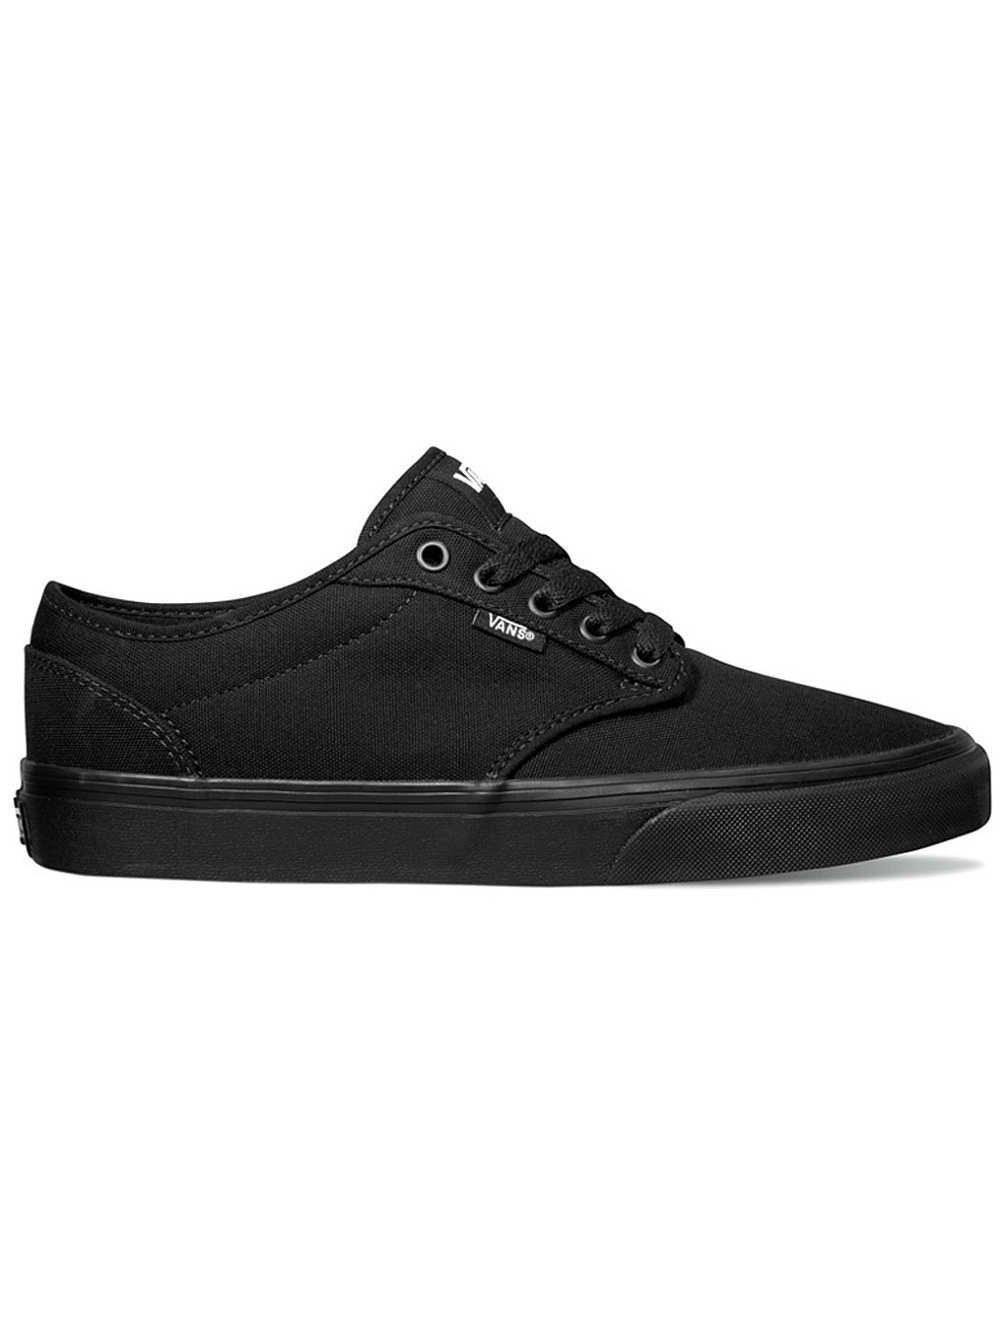 Vans Men's VANS ATWOOD (CANVAS) SKATE SHOES 10 Men US (BLACK/BLACK)